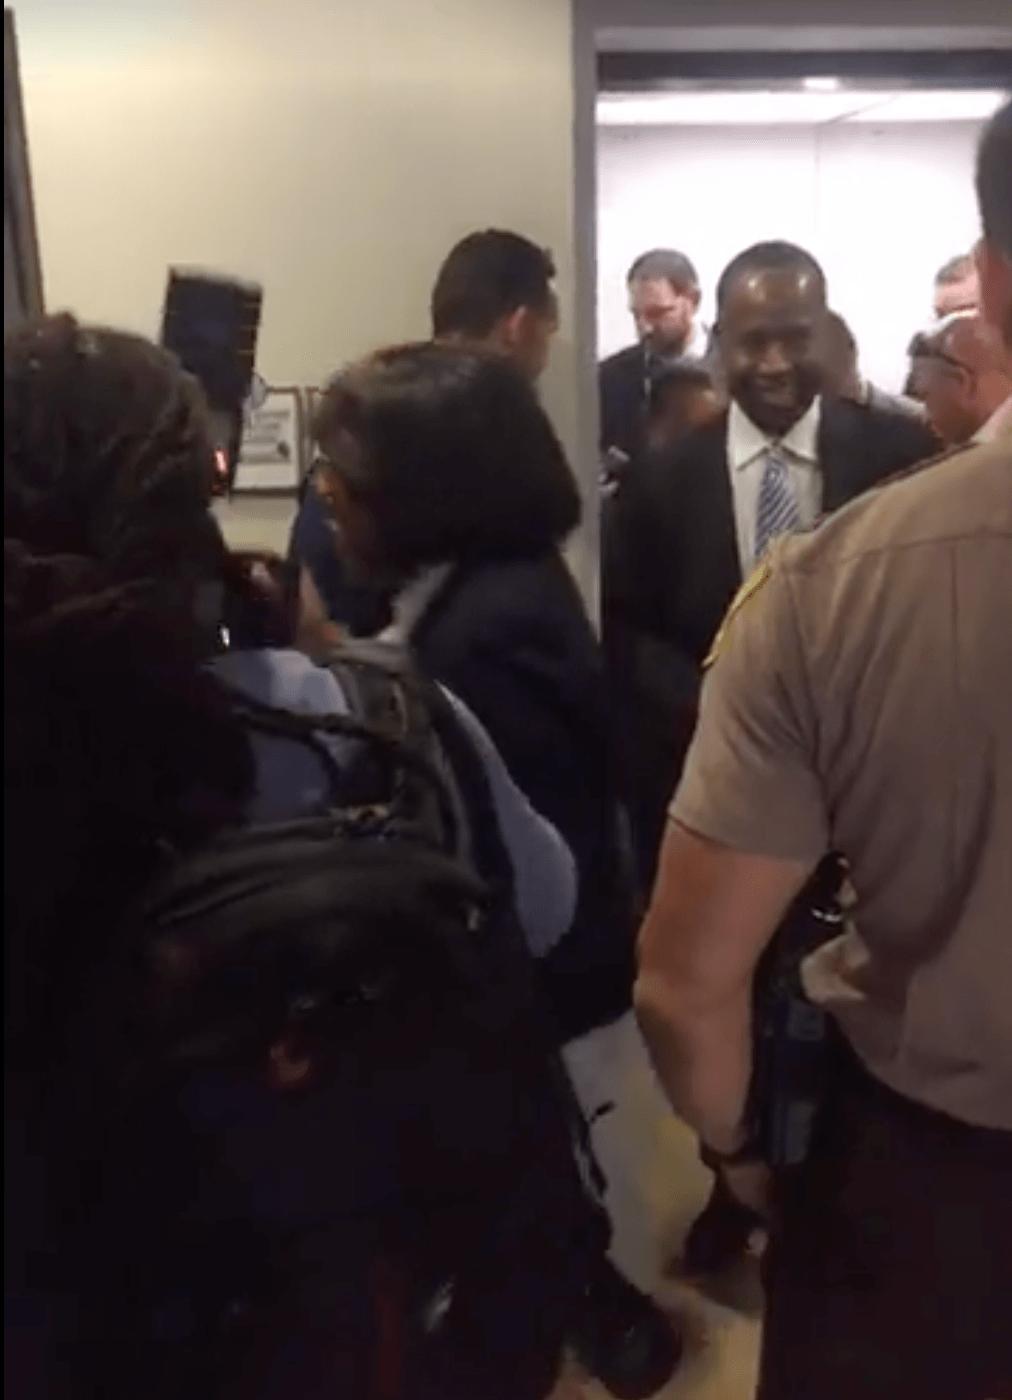 Ben Carson stuck in elevator